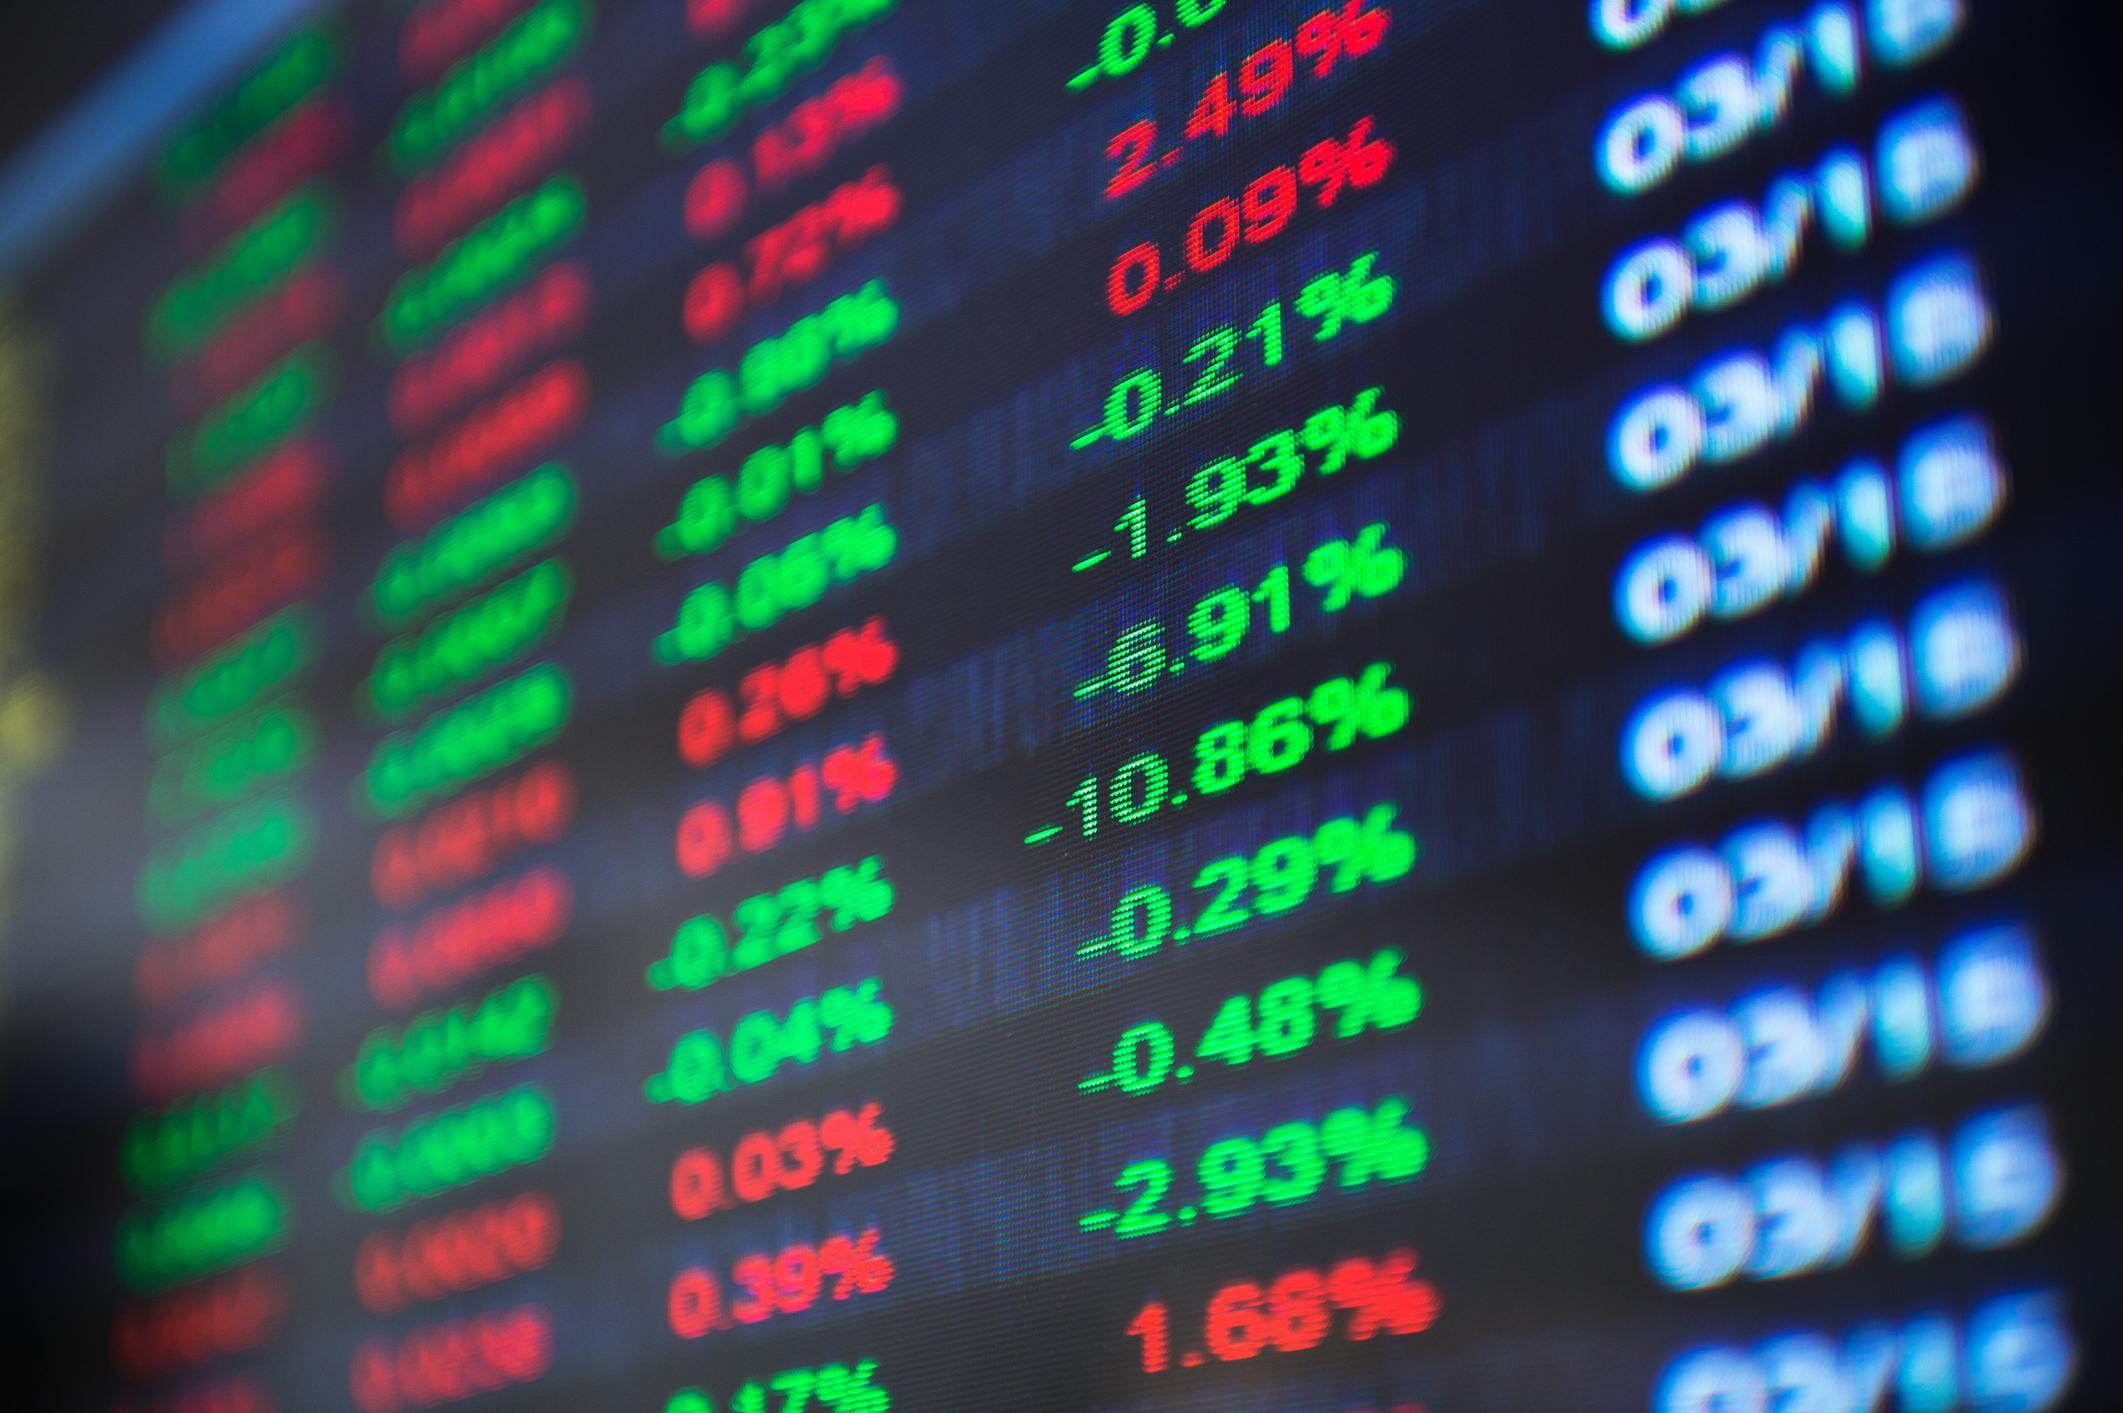 The 30 Dow Jones Stocks The Motley Fool